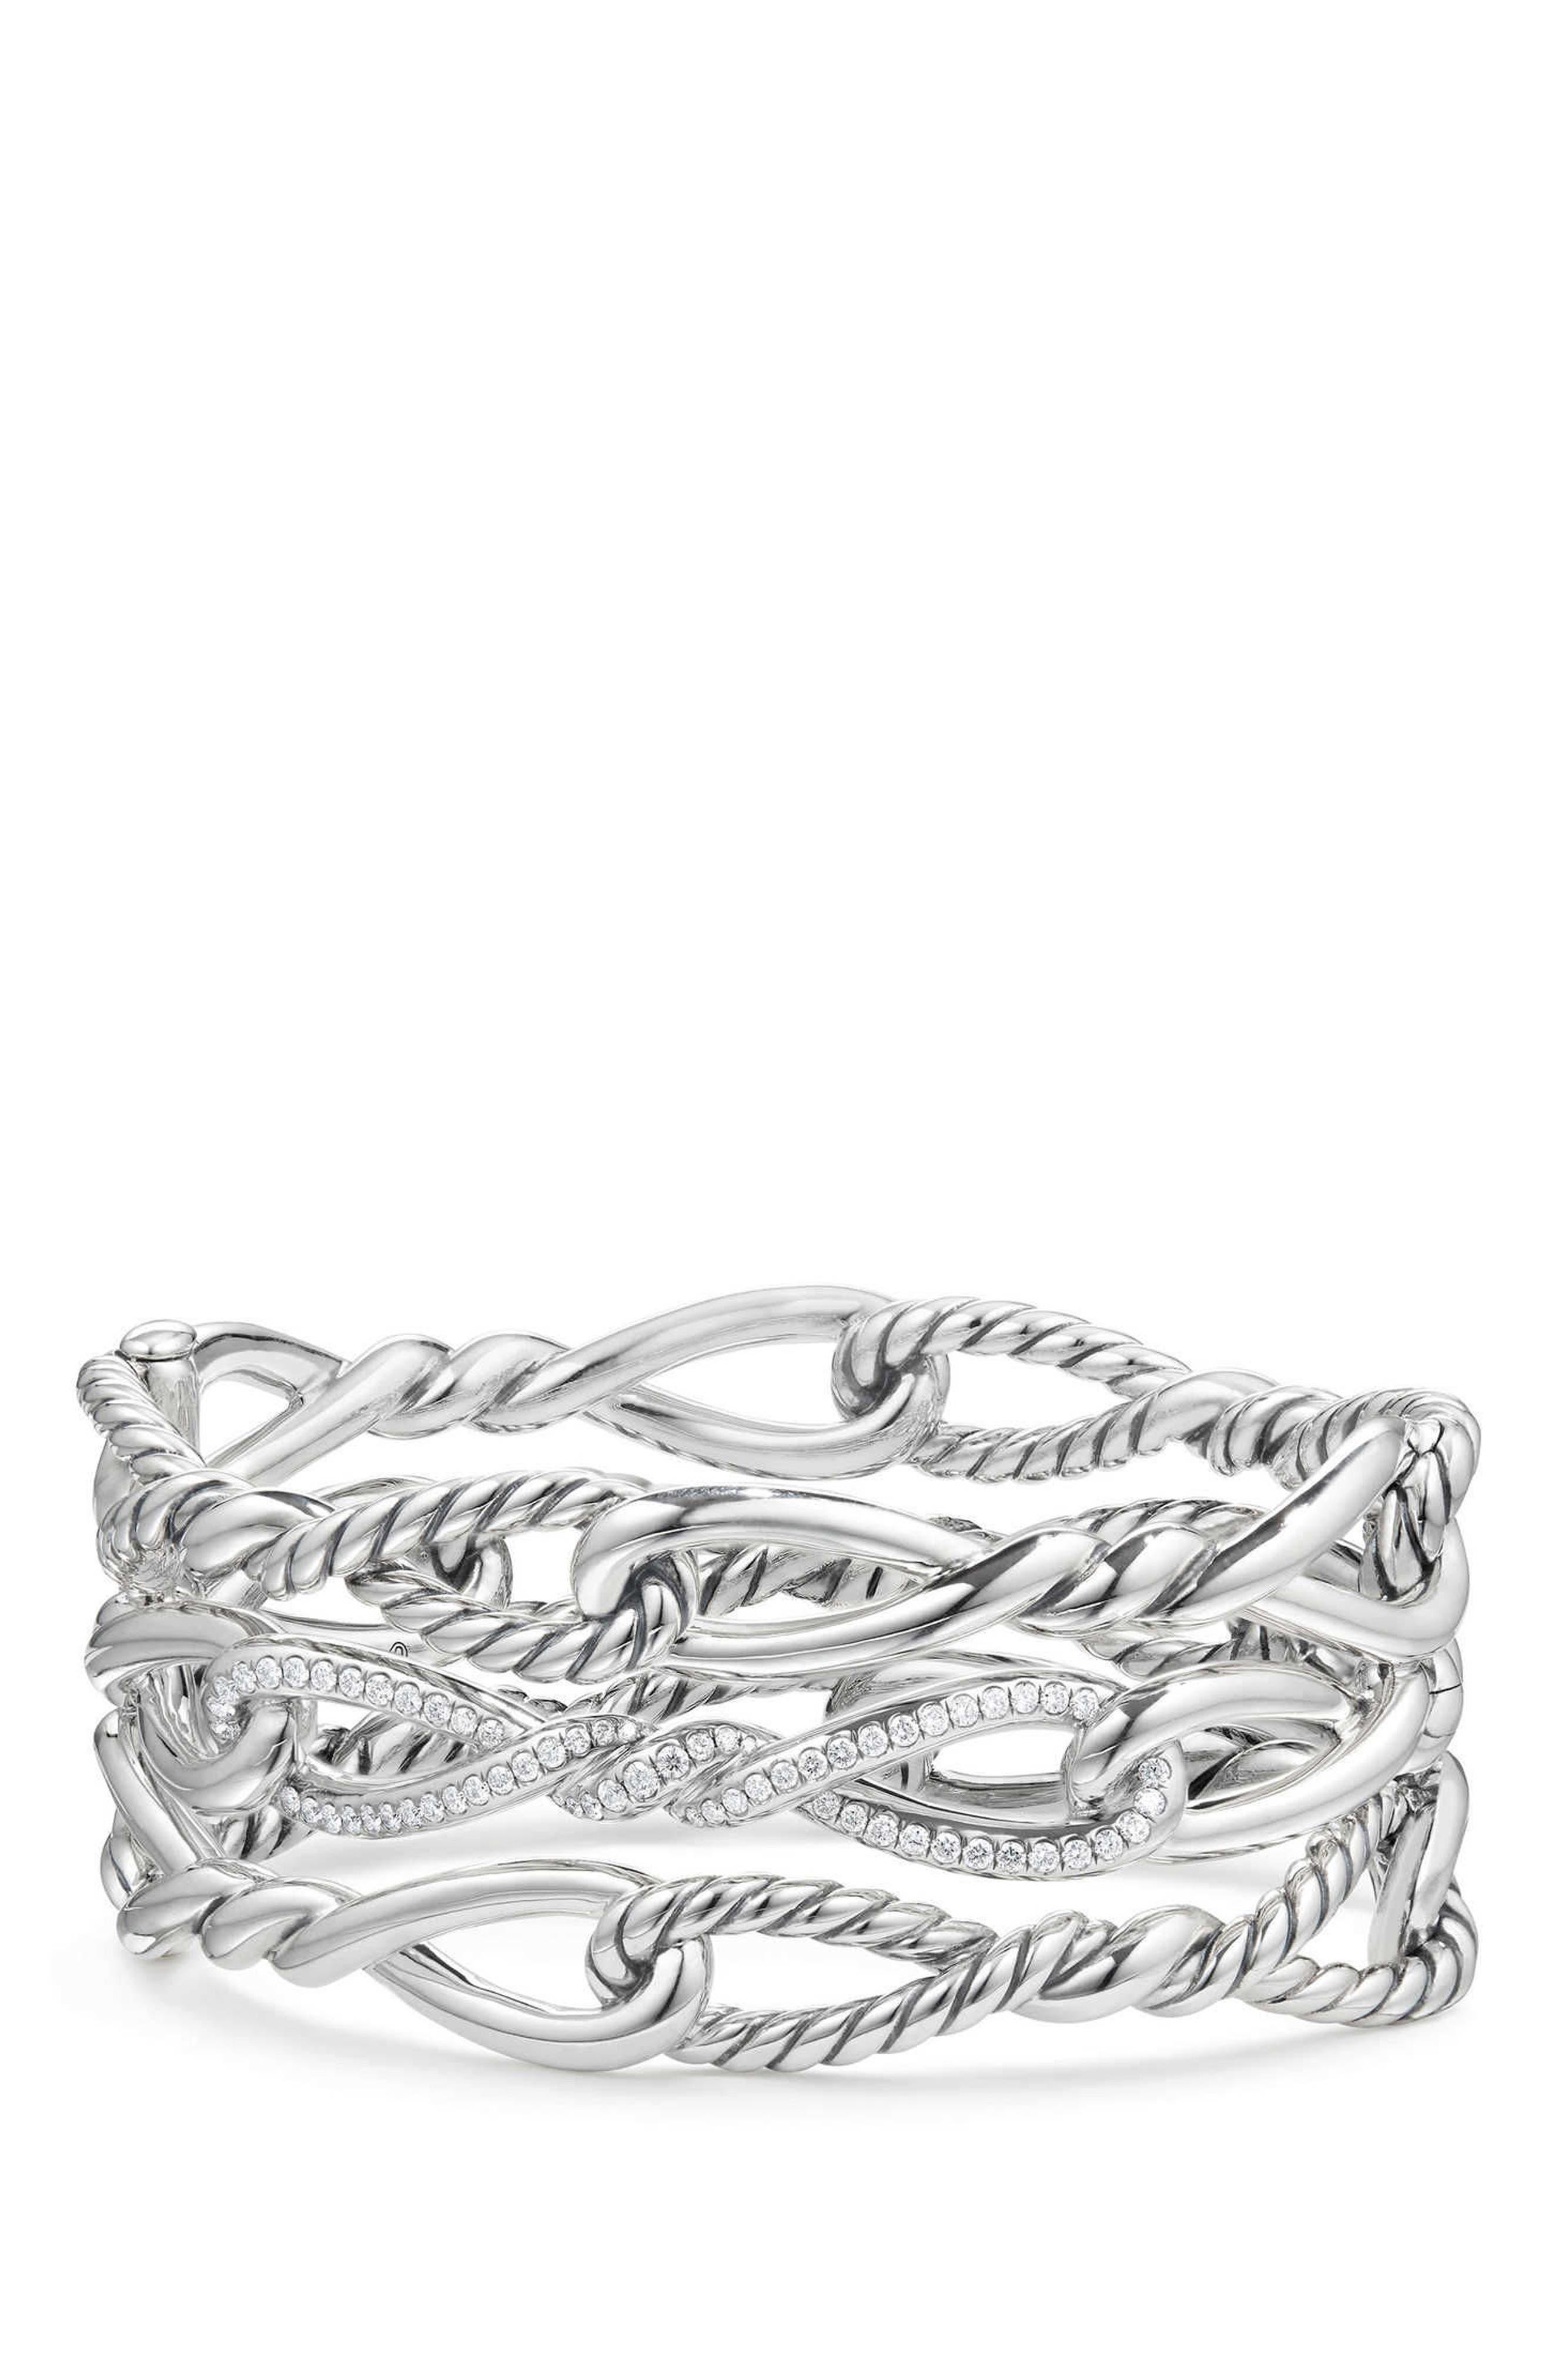 Main Image - David Yurman Continuance Multi Row Cuff Bracelet with Diamonds